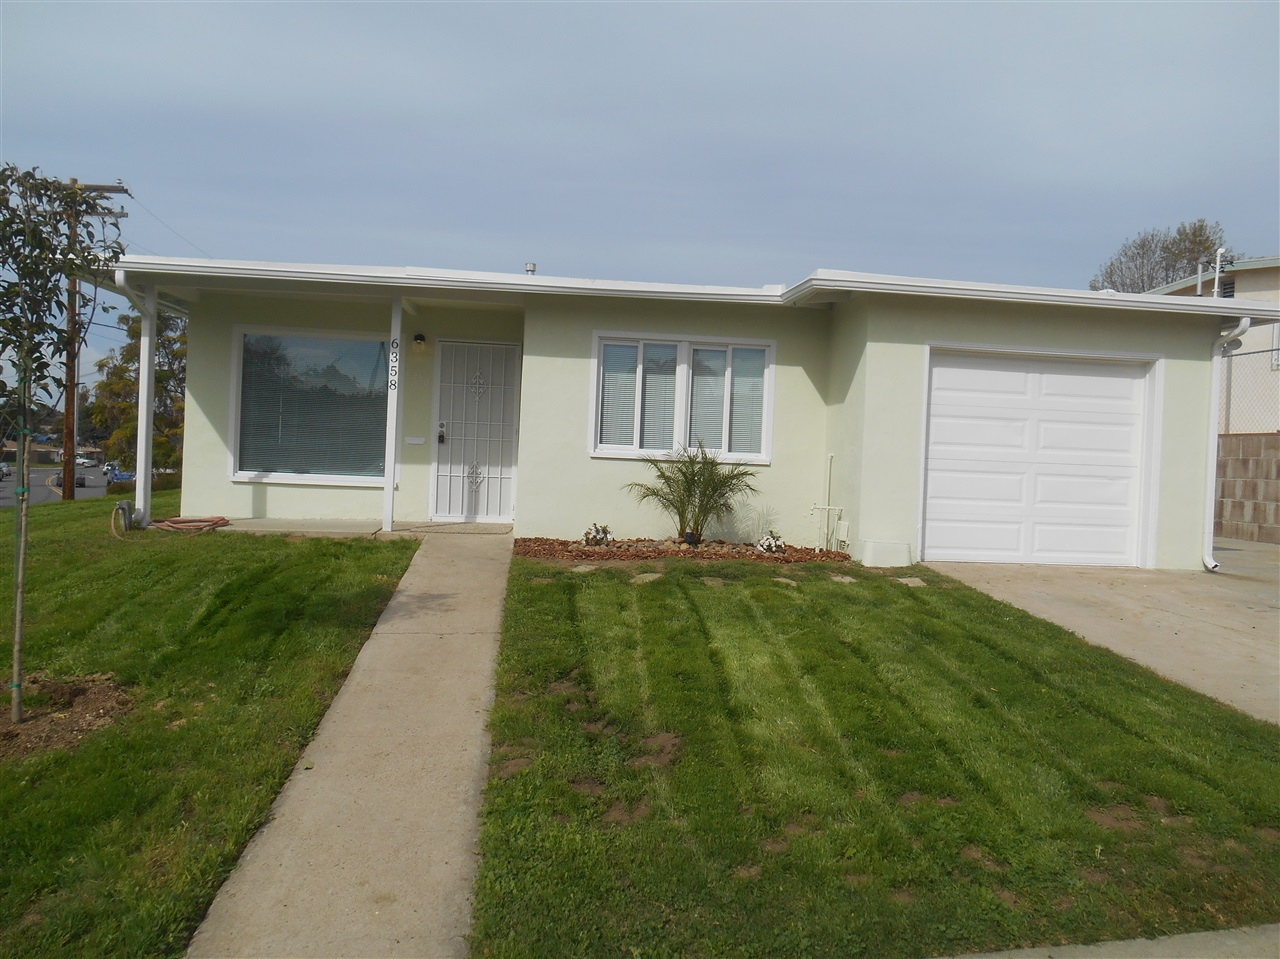 6358 Streamview Dr, San Diego, CA